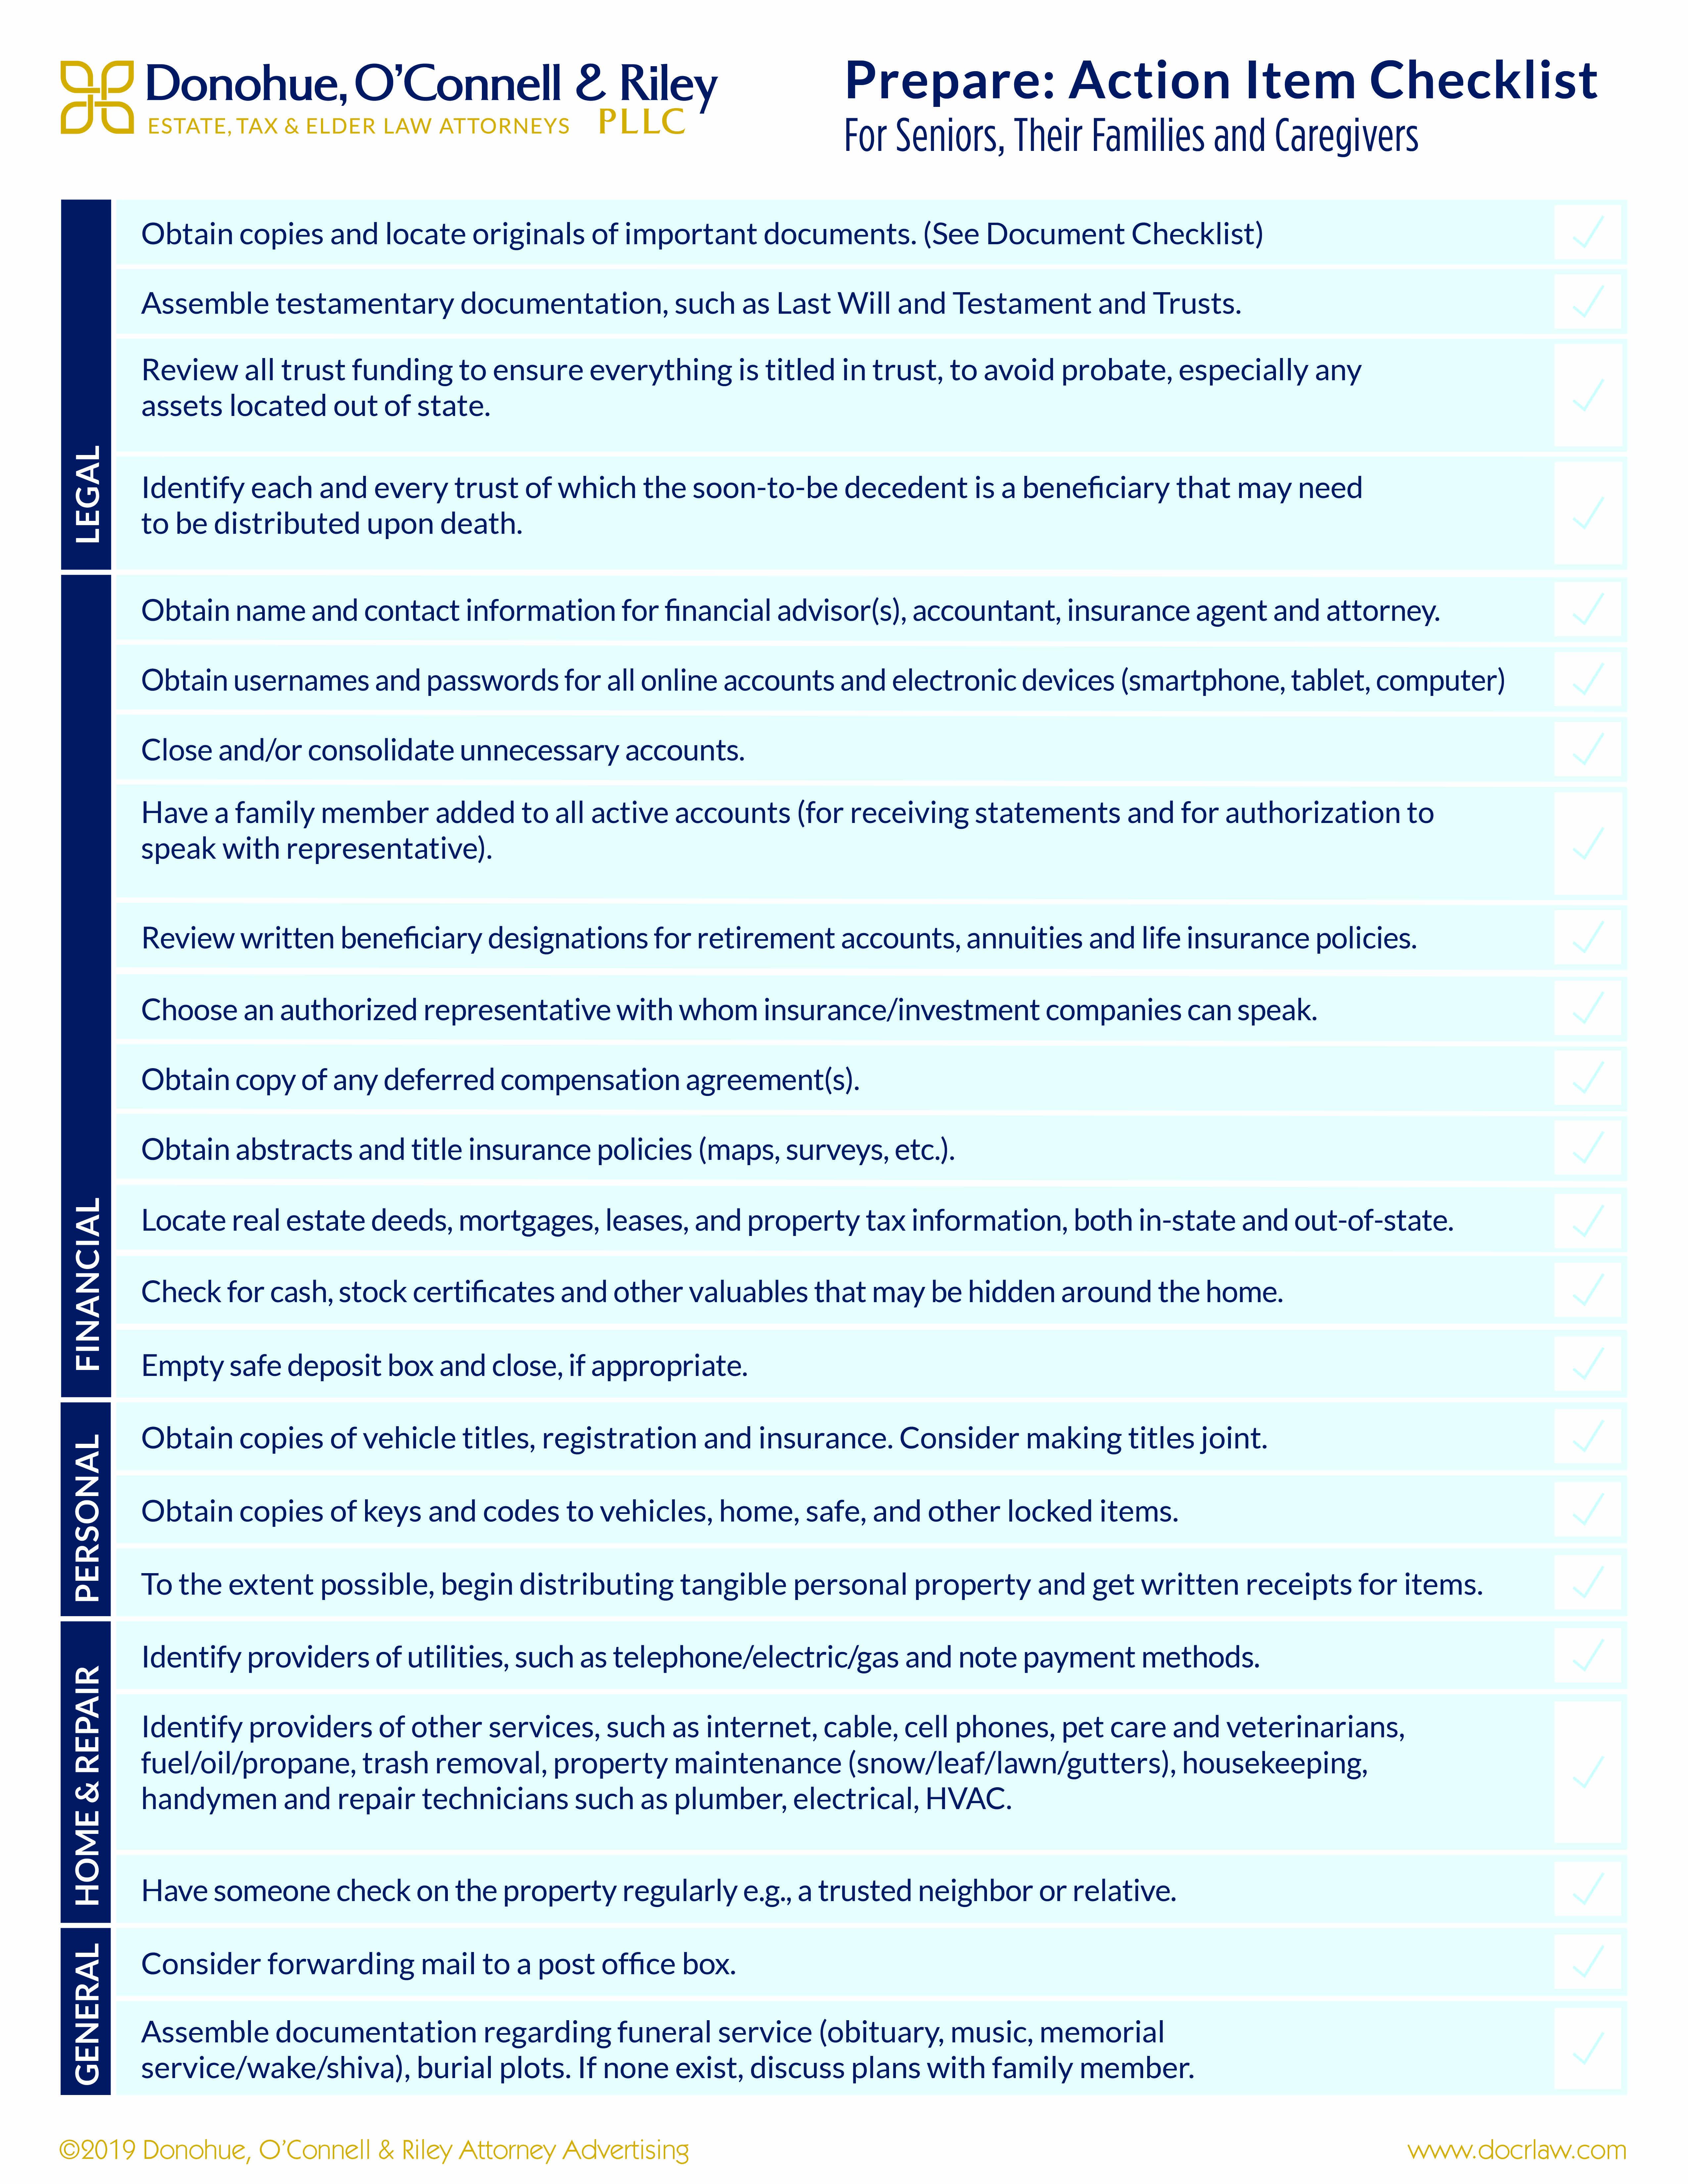 DOCR_Action_Checklist